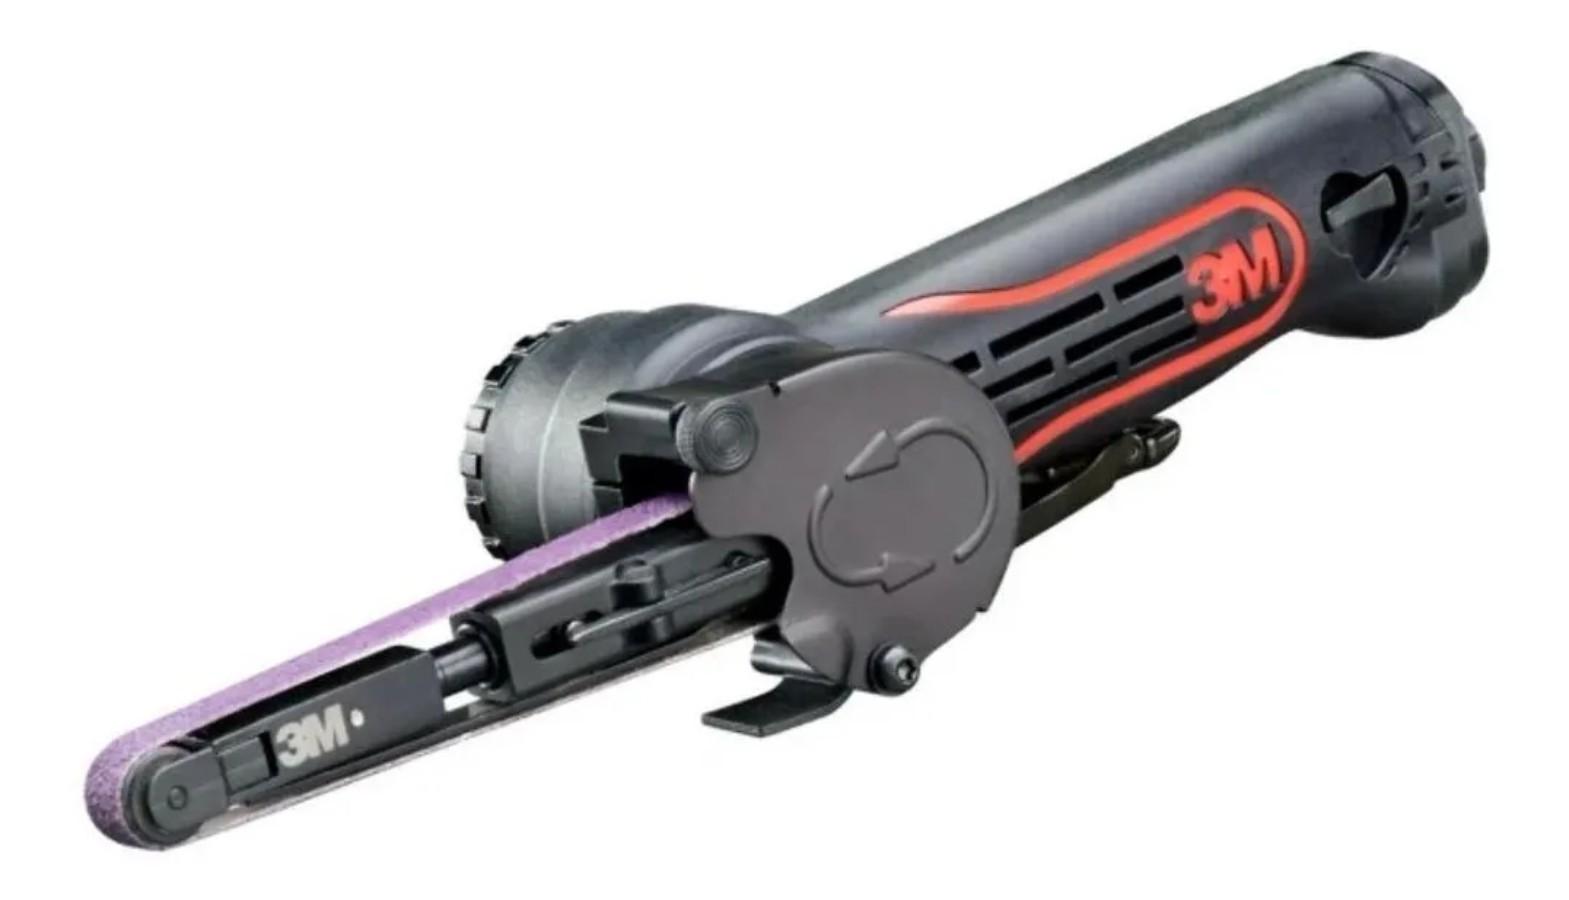 Lixadeira de Correias Abrasivas 3M Filebelt - HB004495212